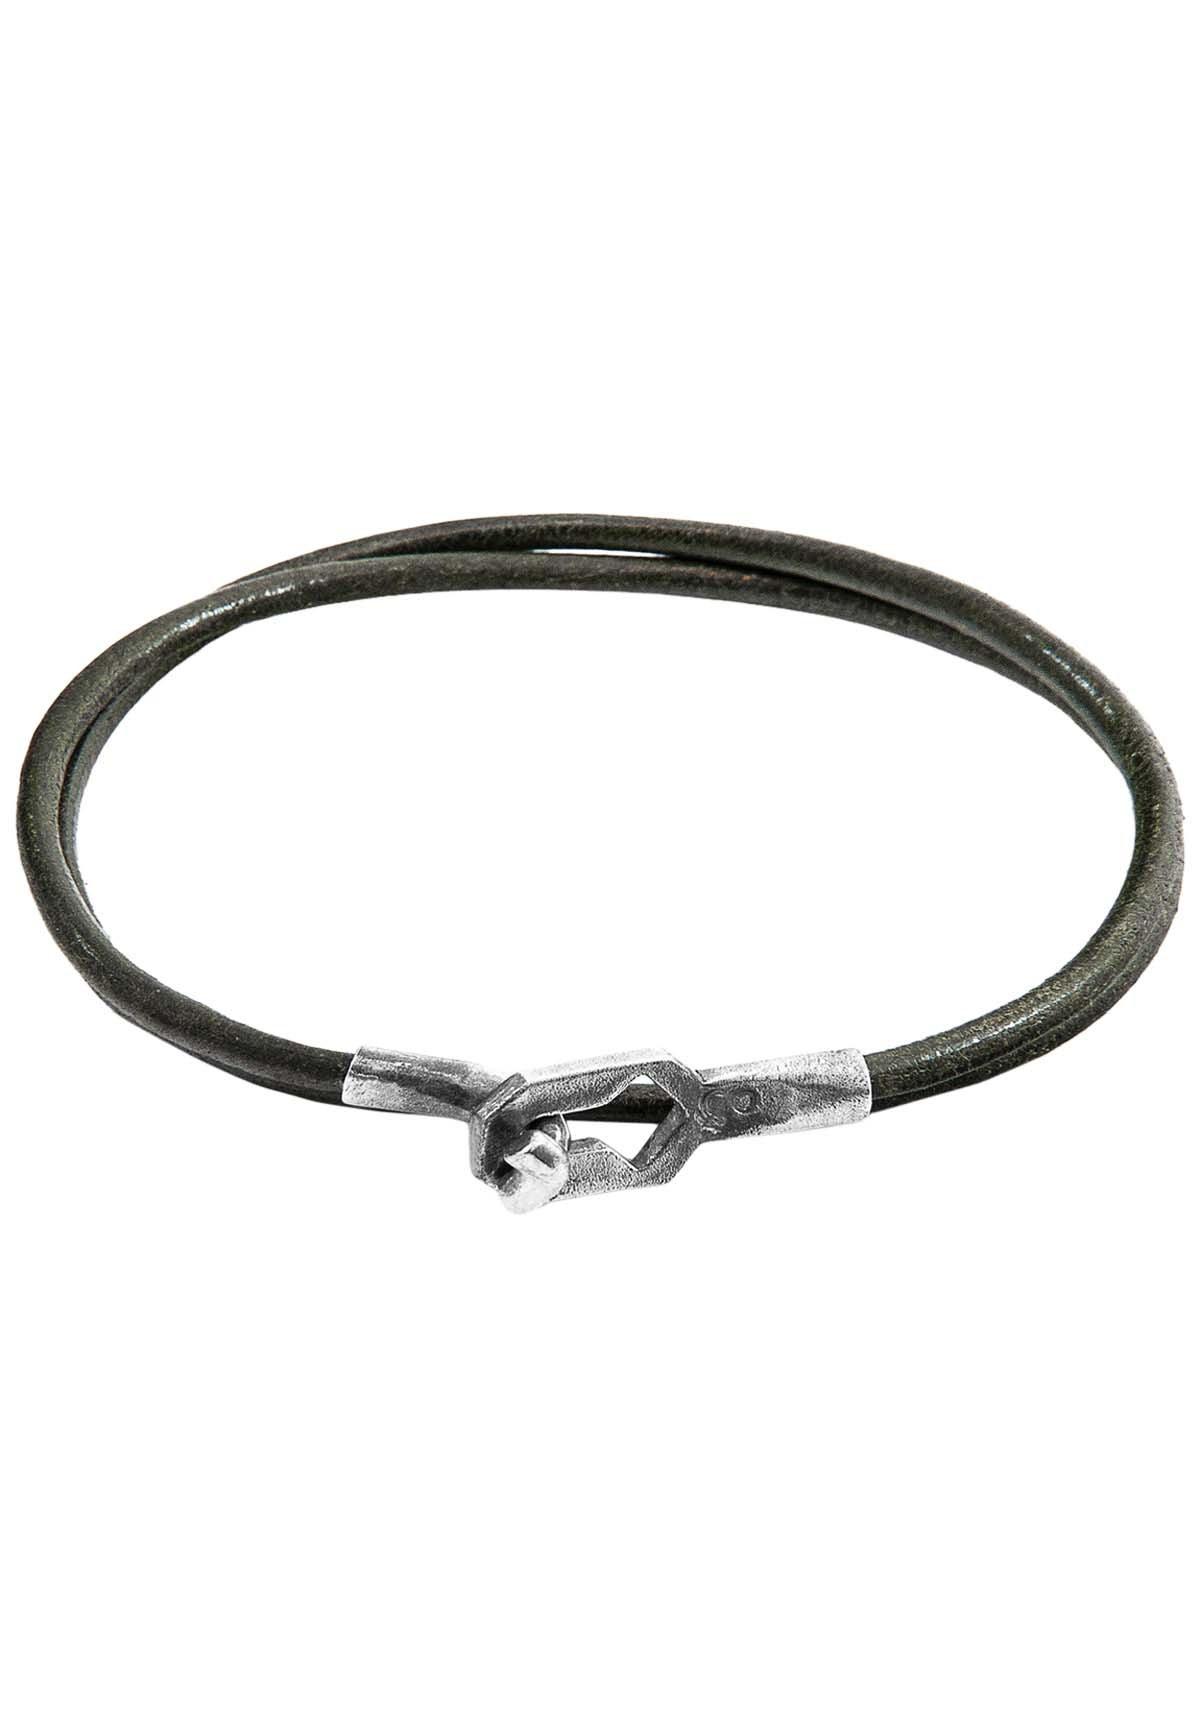 Anchor & Crew Armband - Black/schwarz